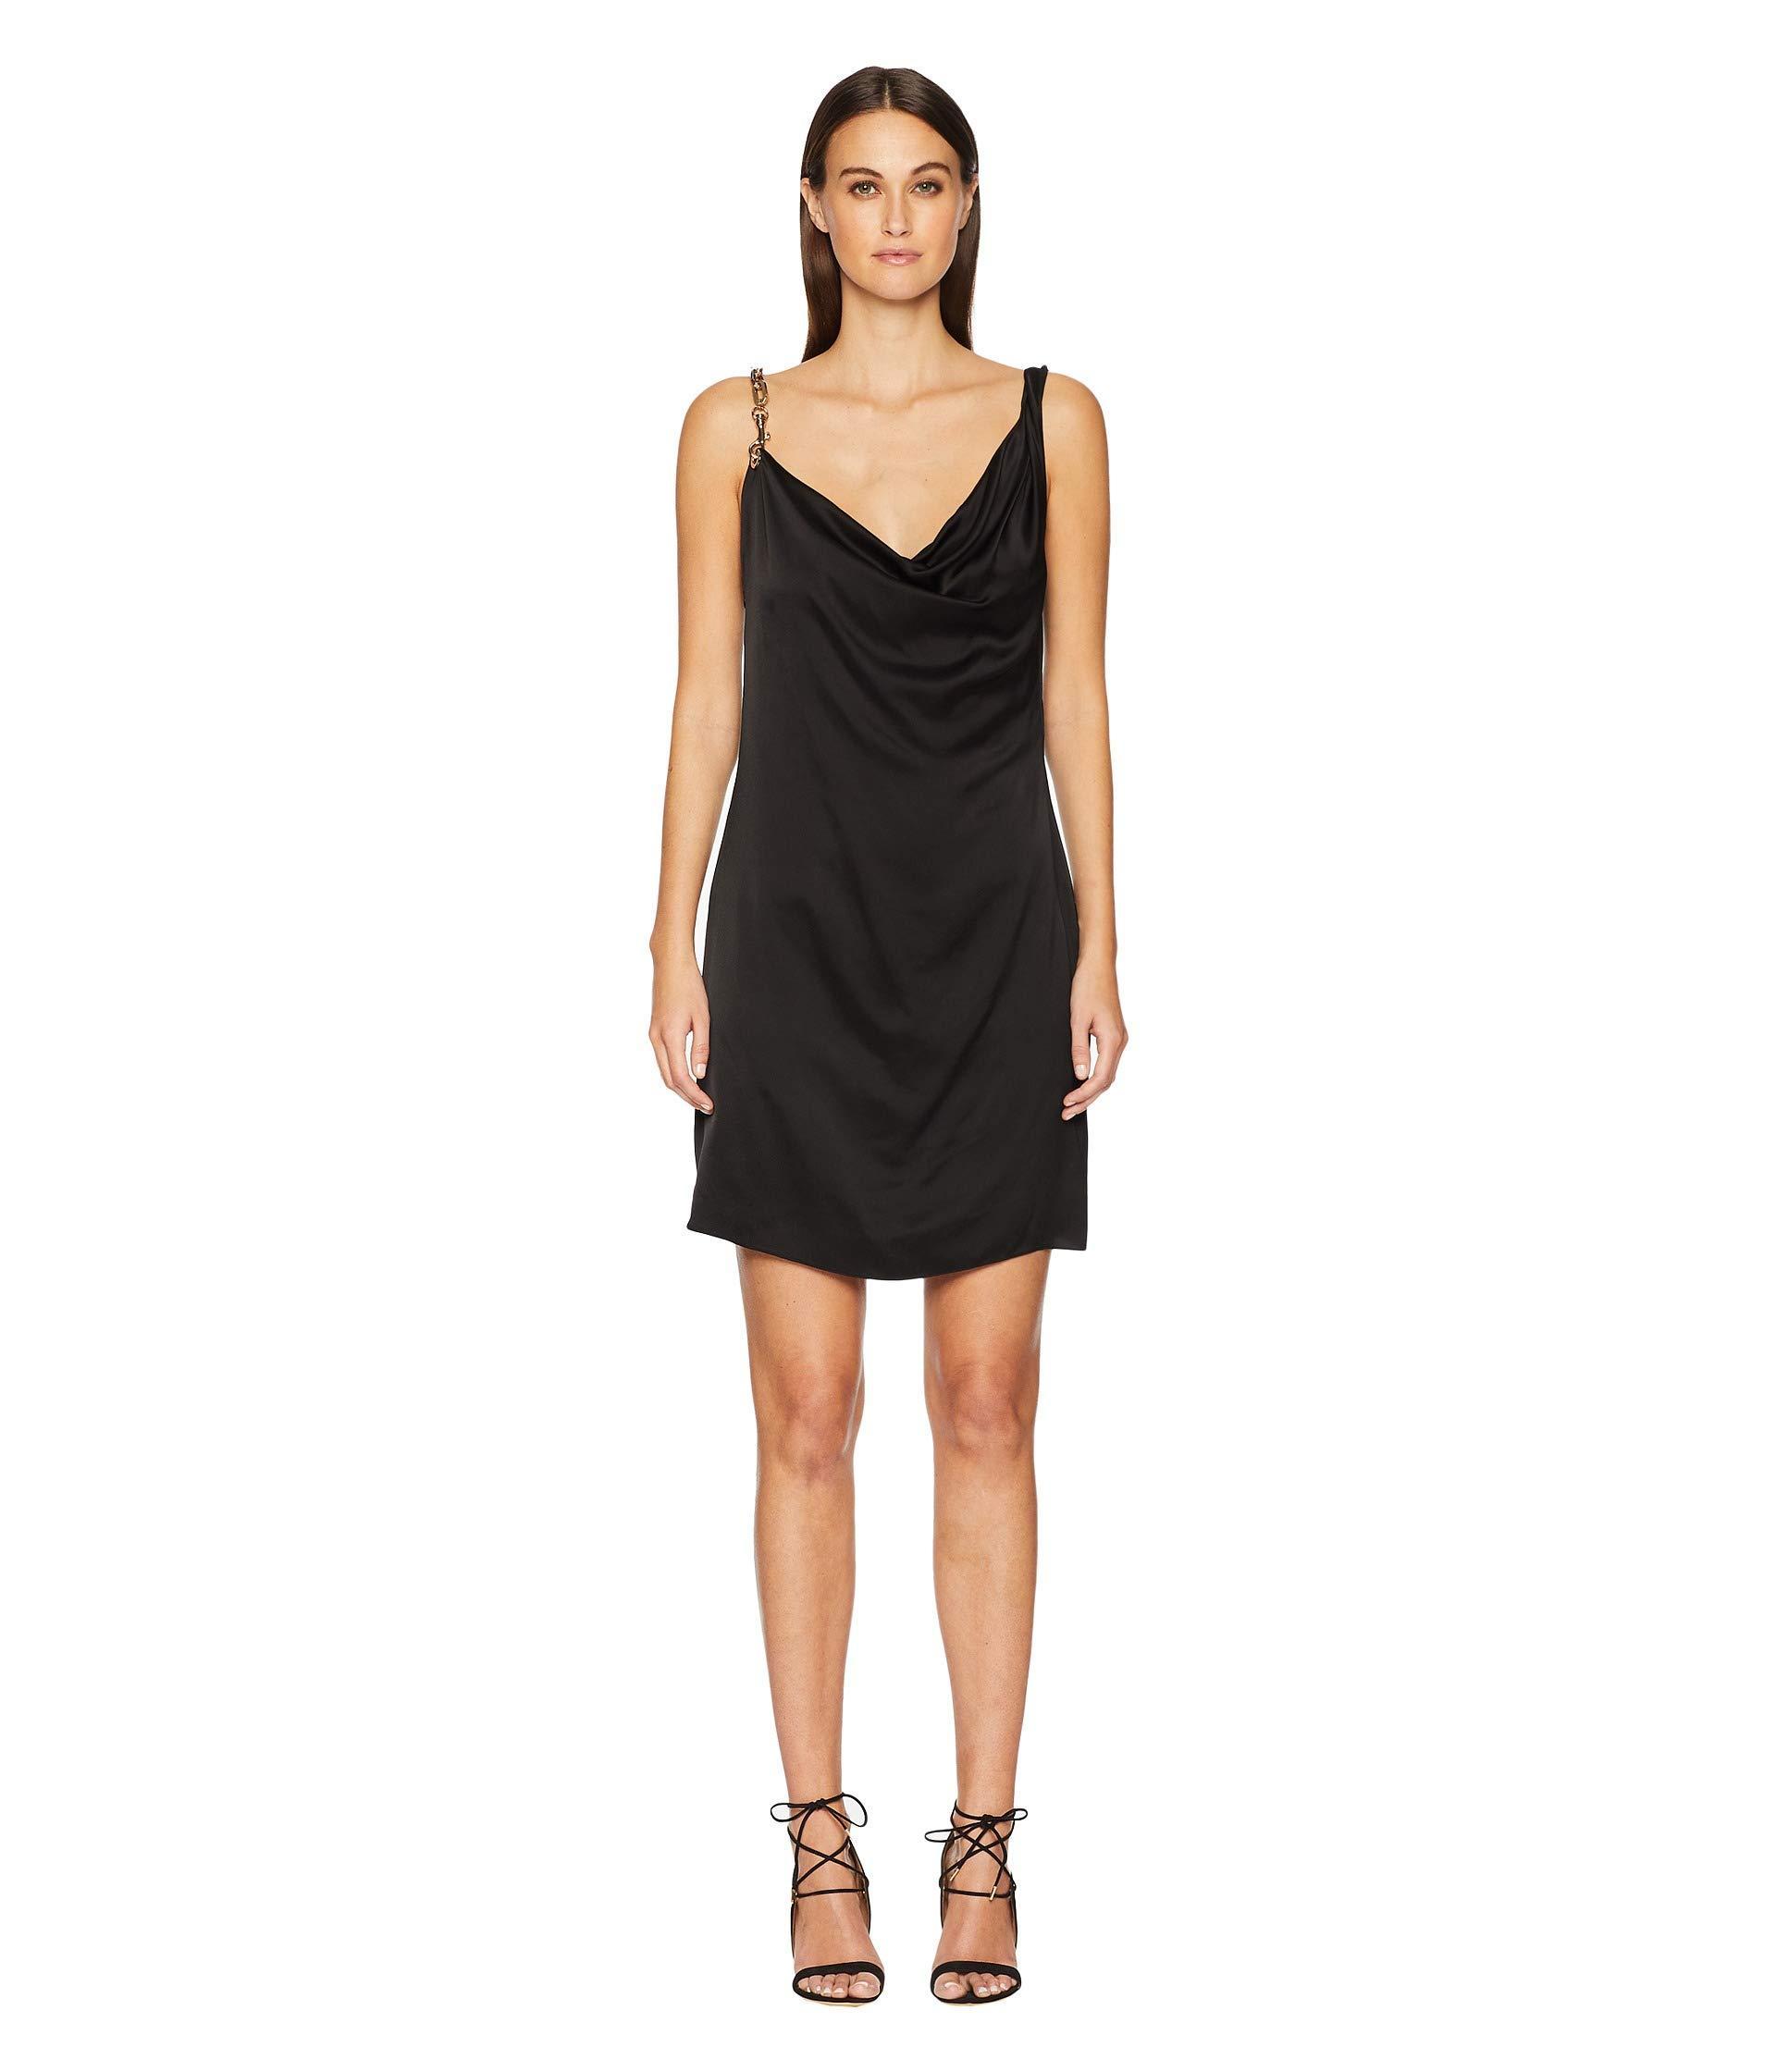 cc500544ca36 Versus - Black Abito Donna Tessuto Dress - Lyst. View fullscreen